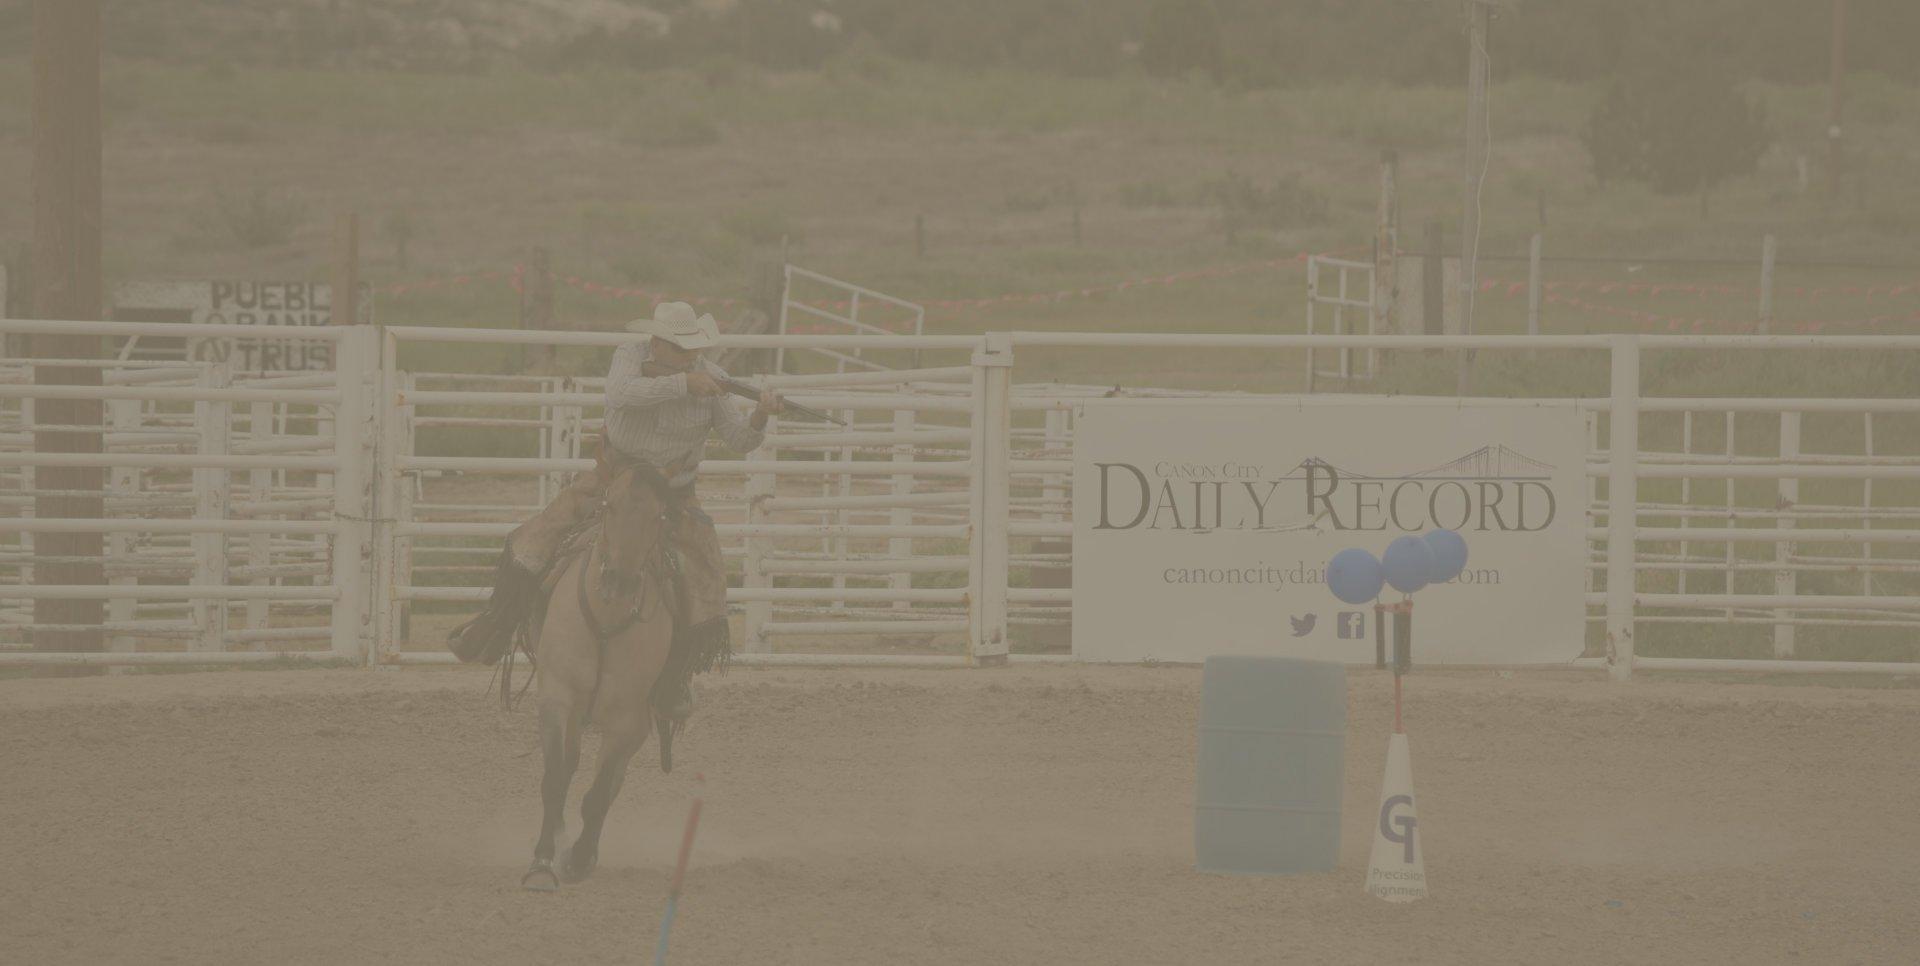 Riding horse image